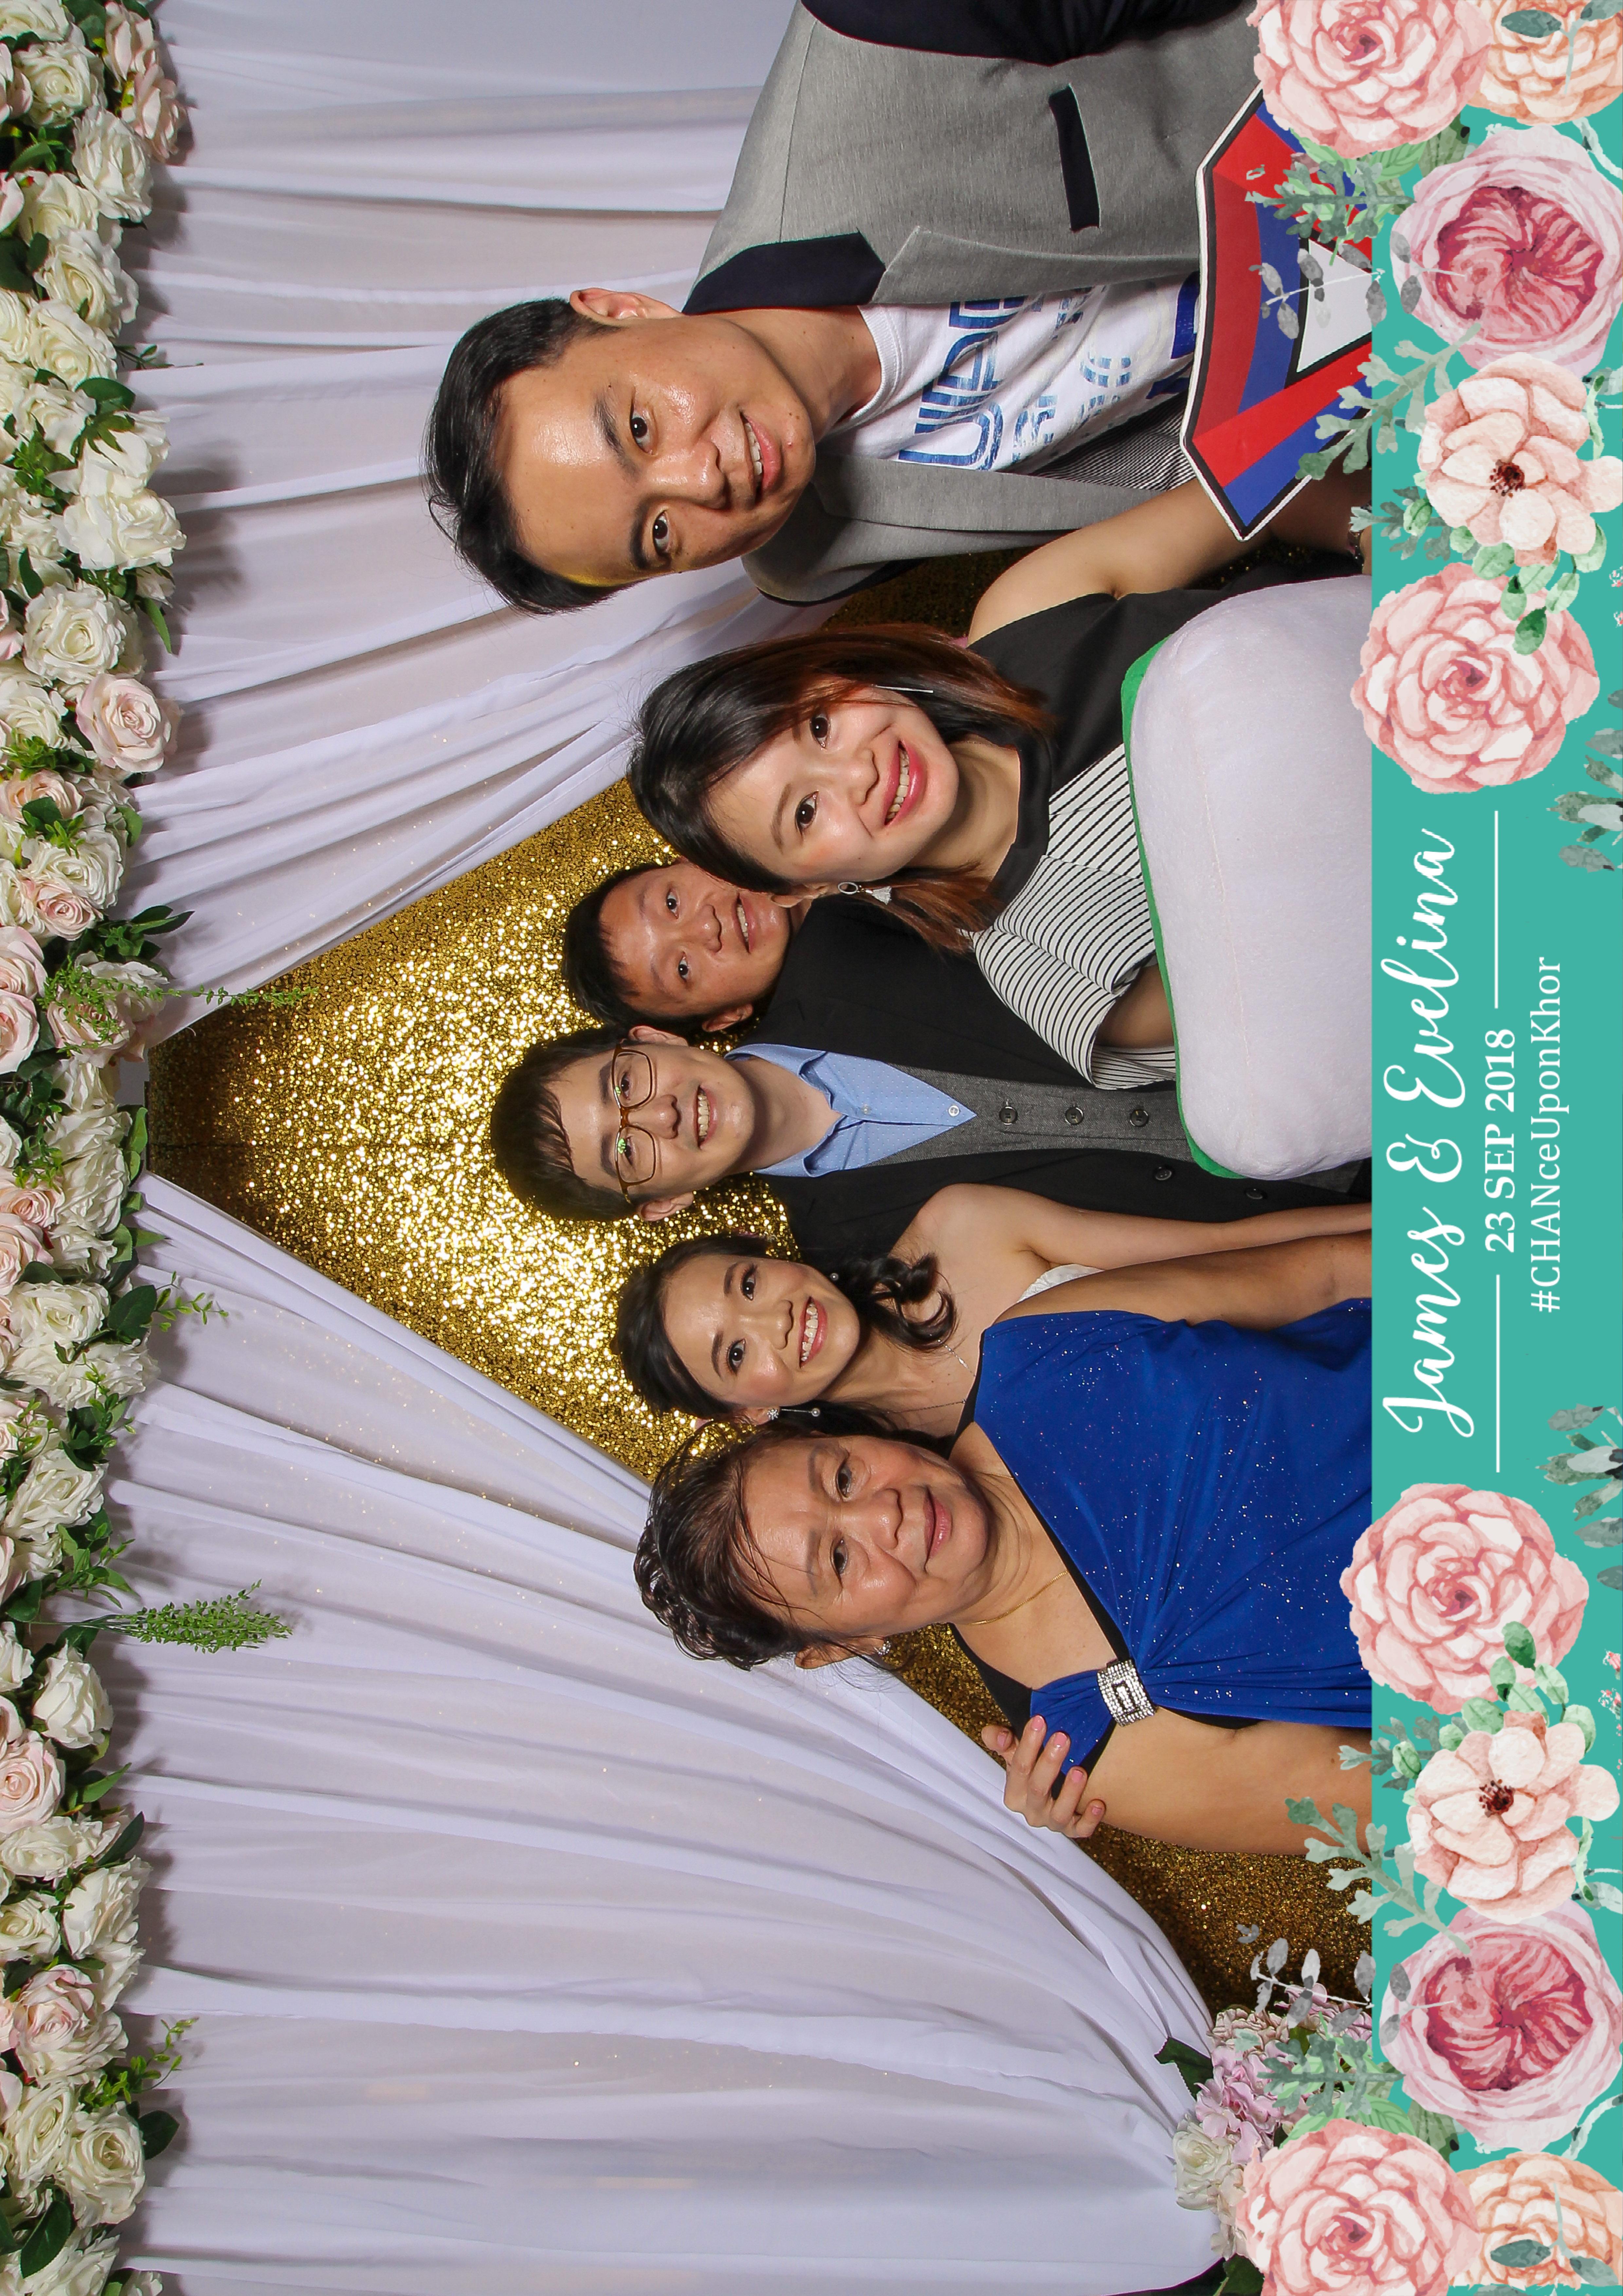 wedding photo booth singapore-5